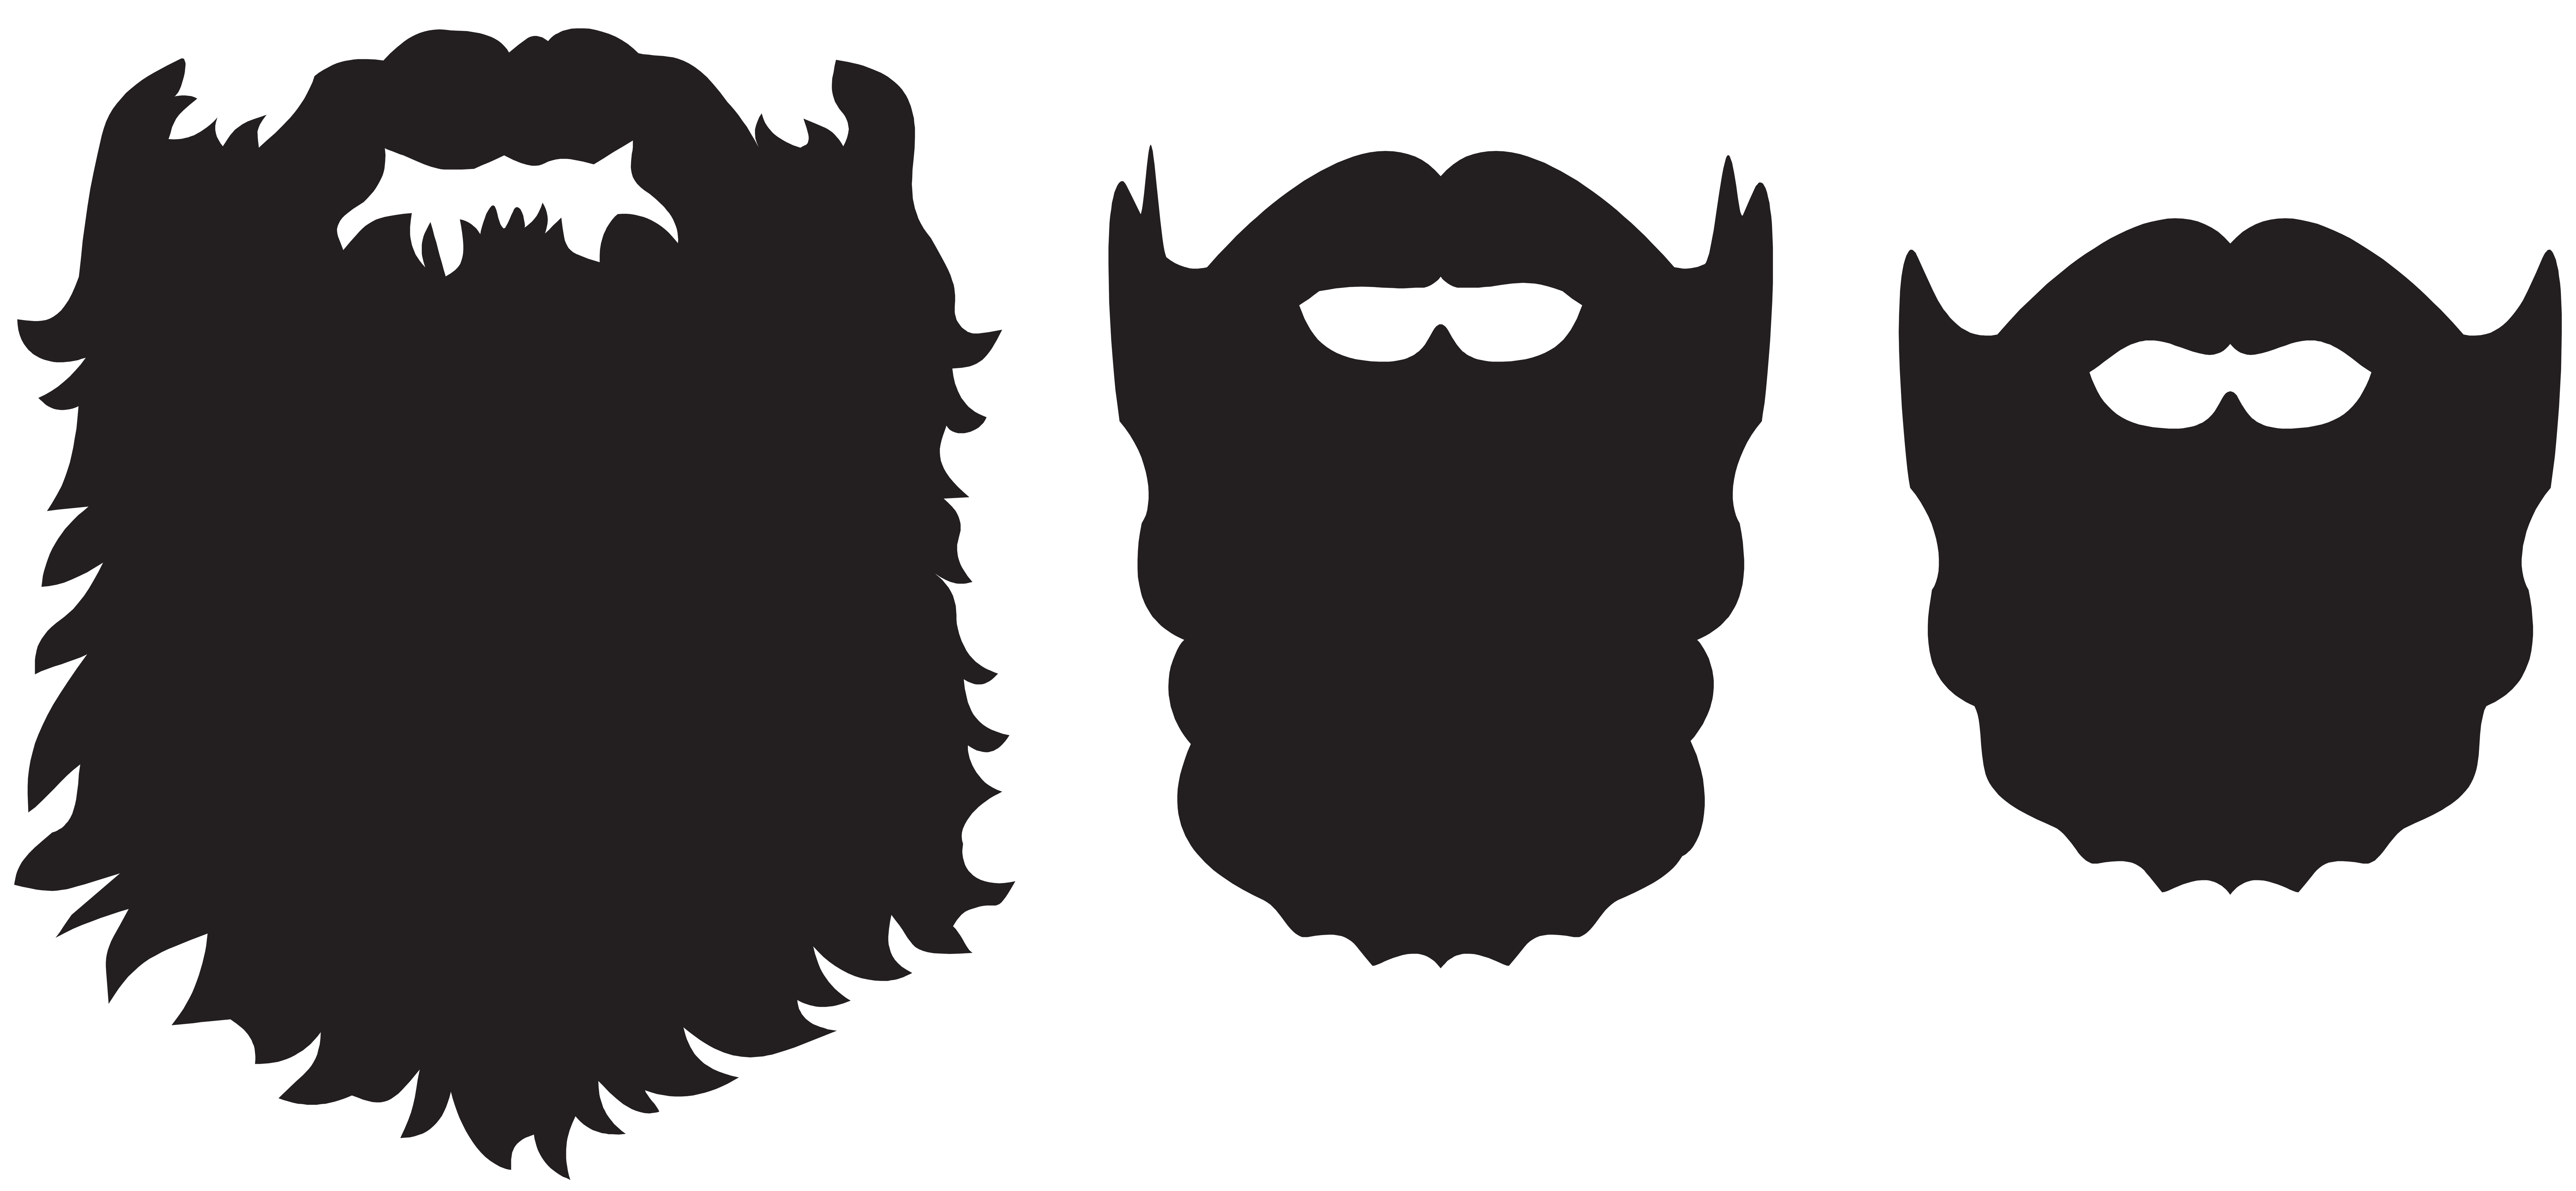 Beard set png image. Lumberjack clipart clip art